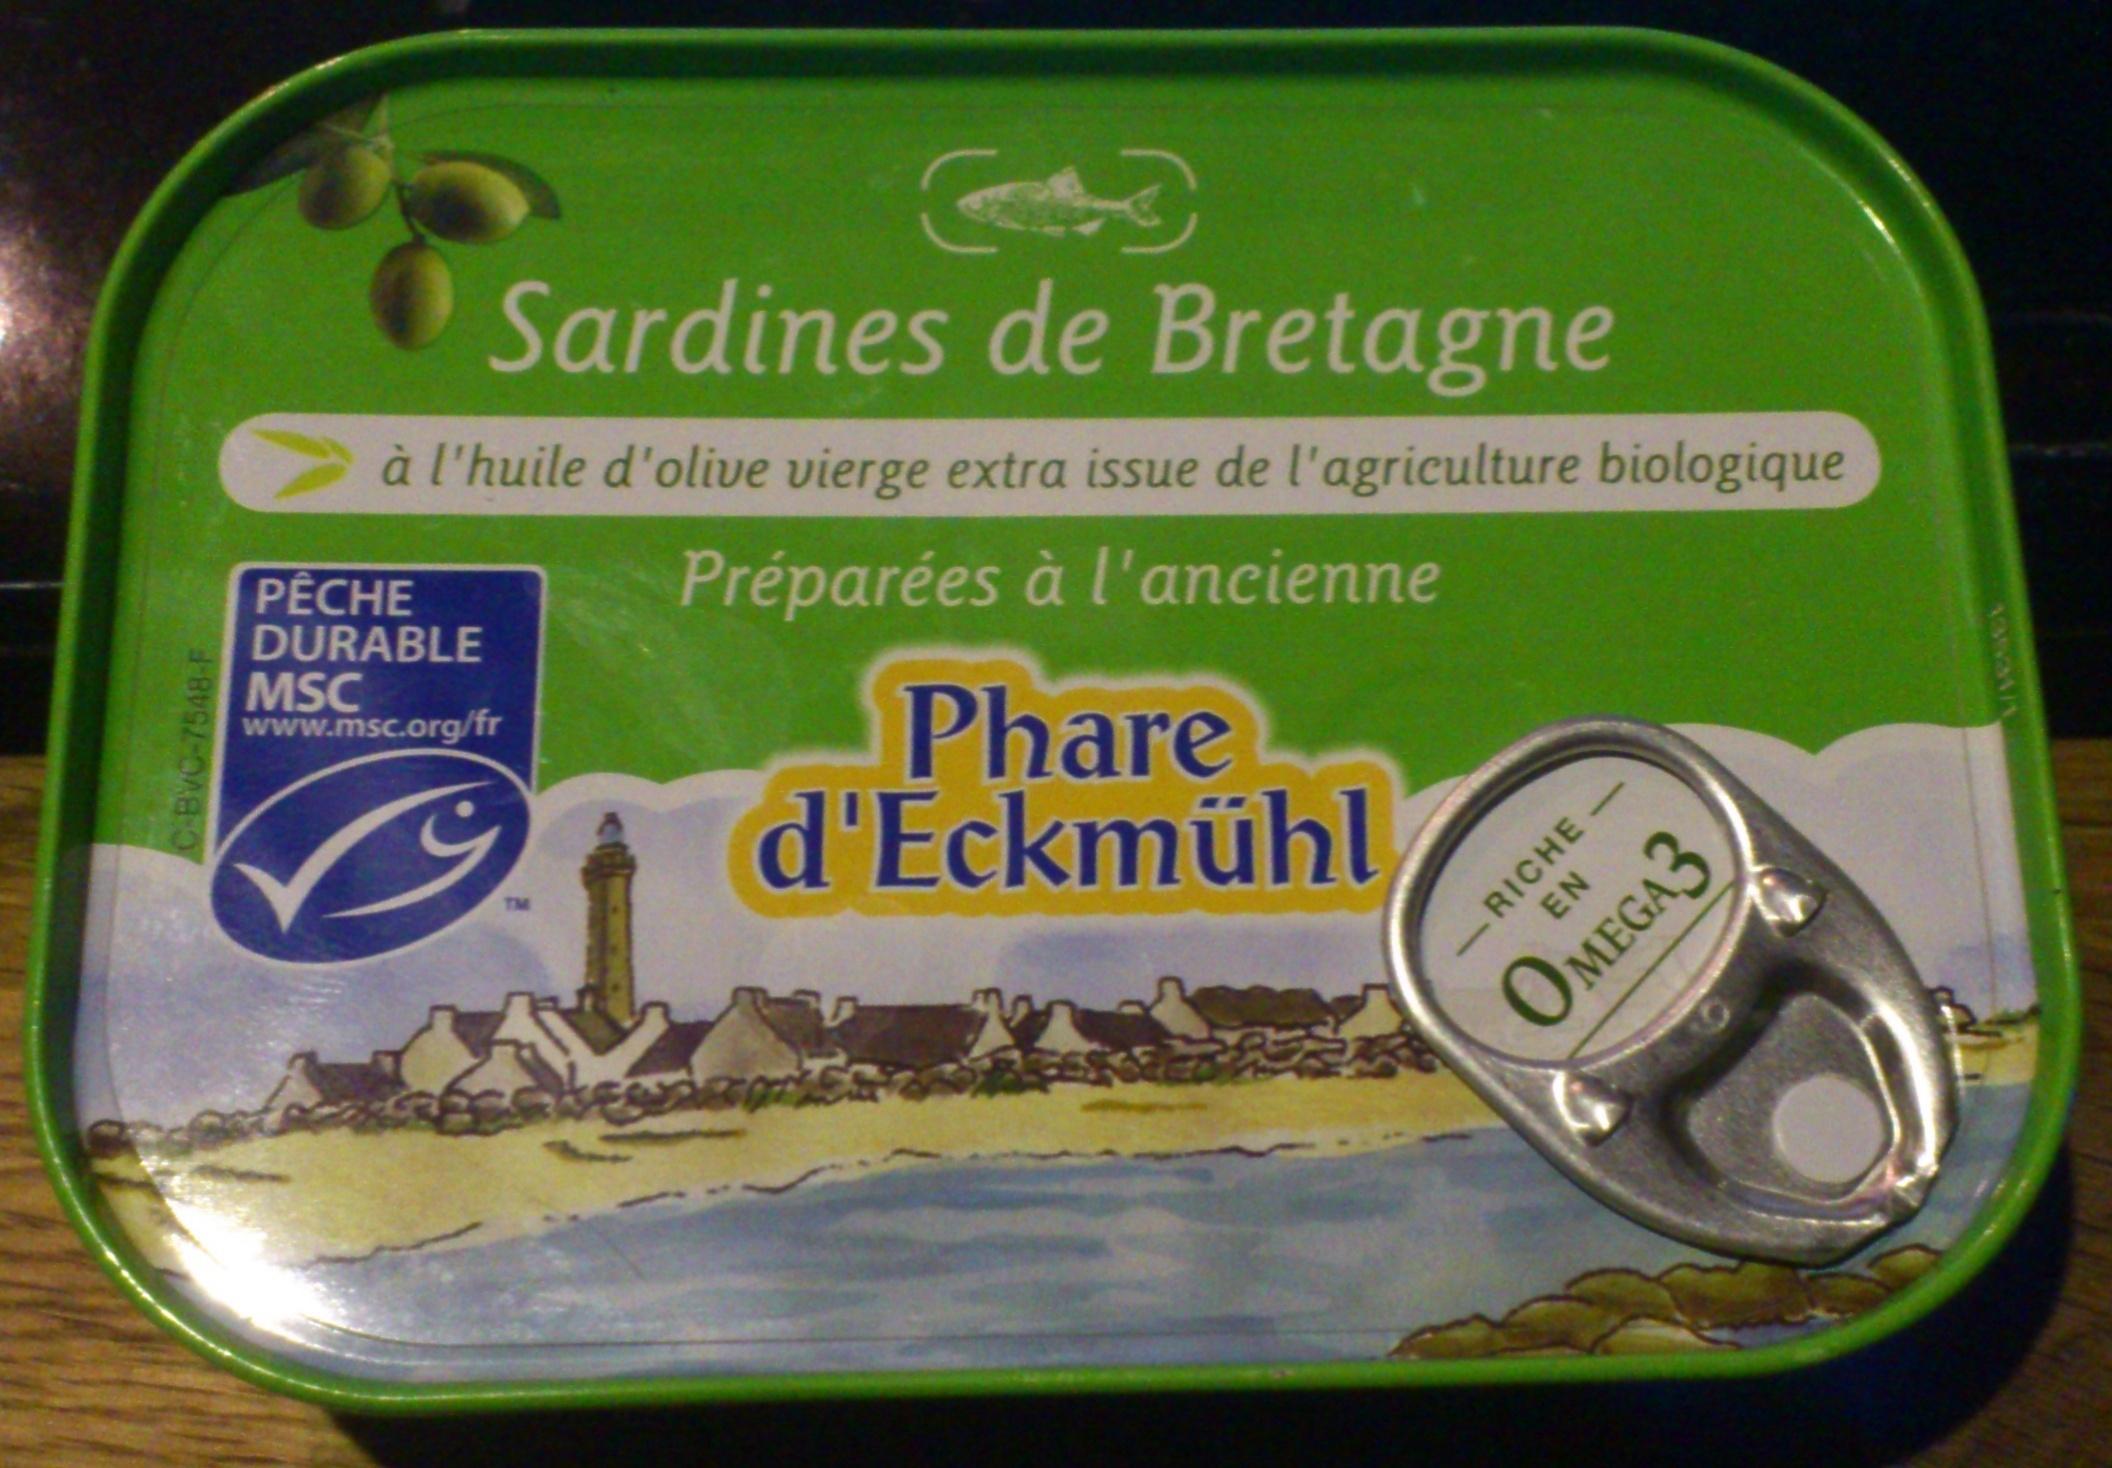 Sardines de Bretagne - Produit - fr